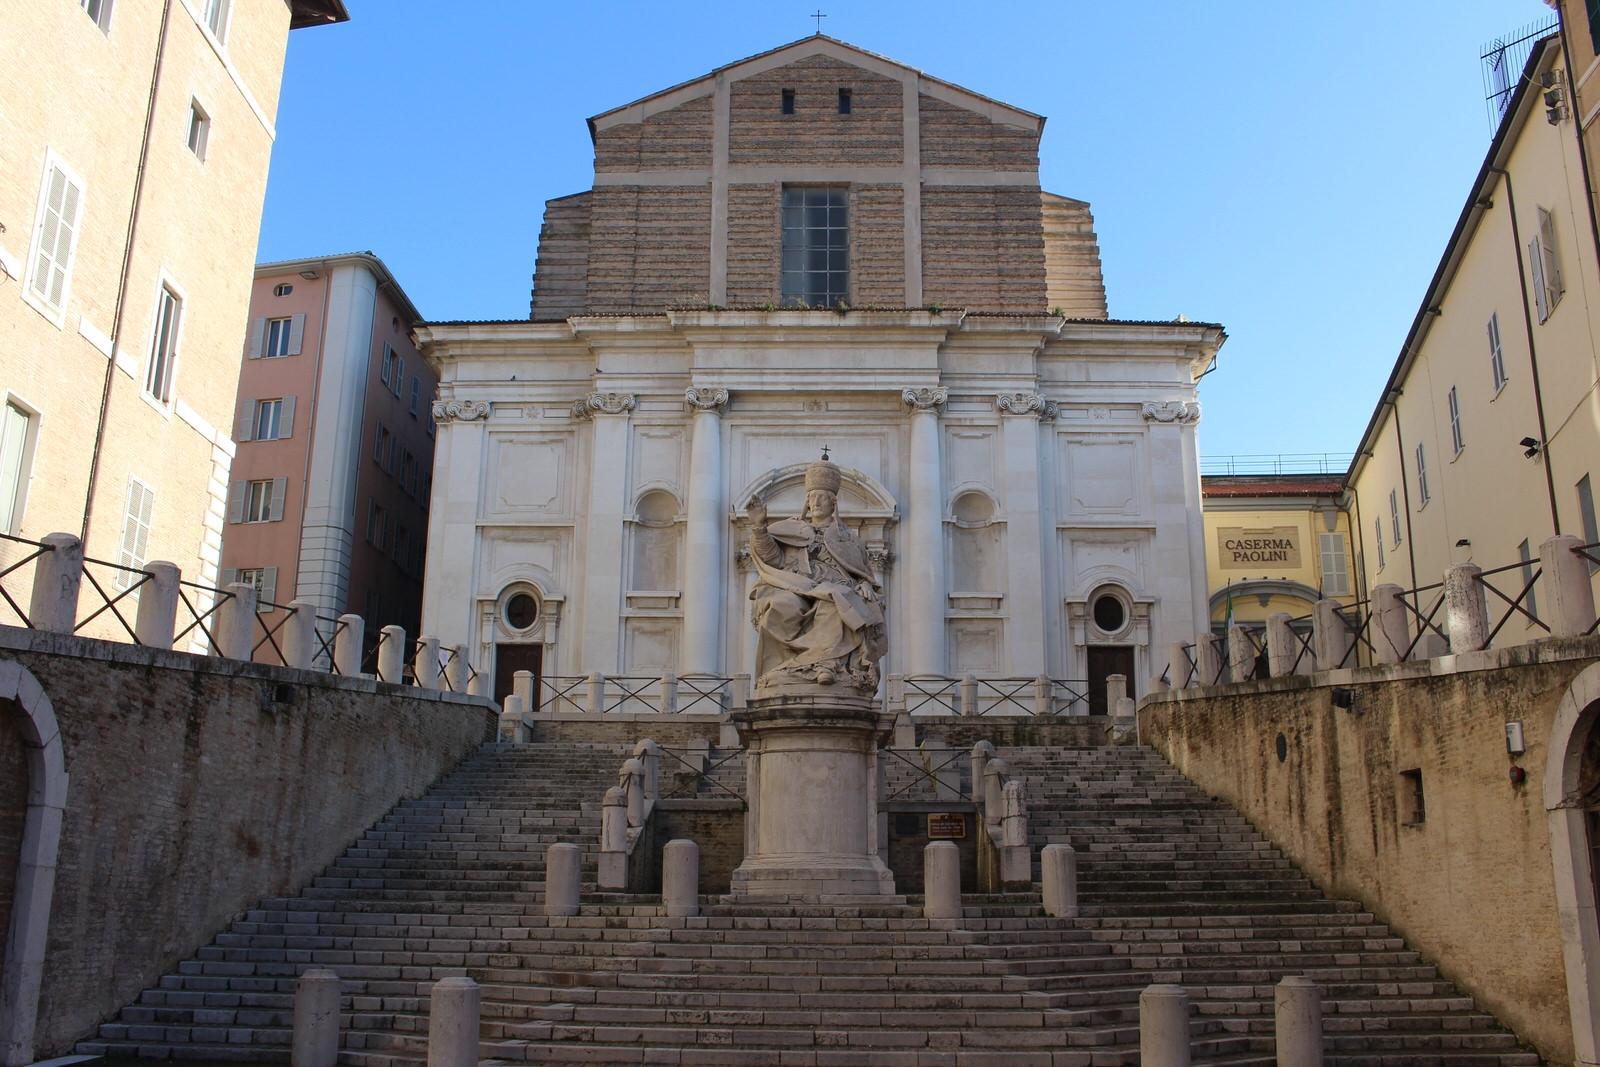 Ancona_Piazza_del_papa_2